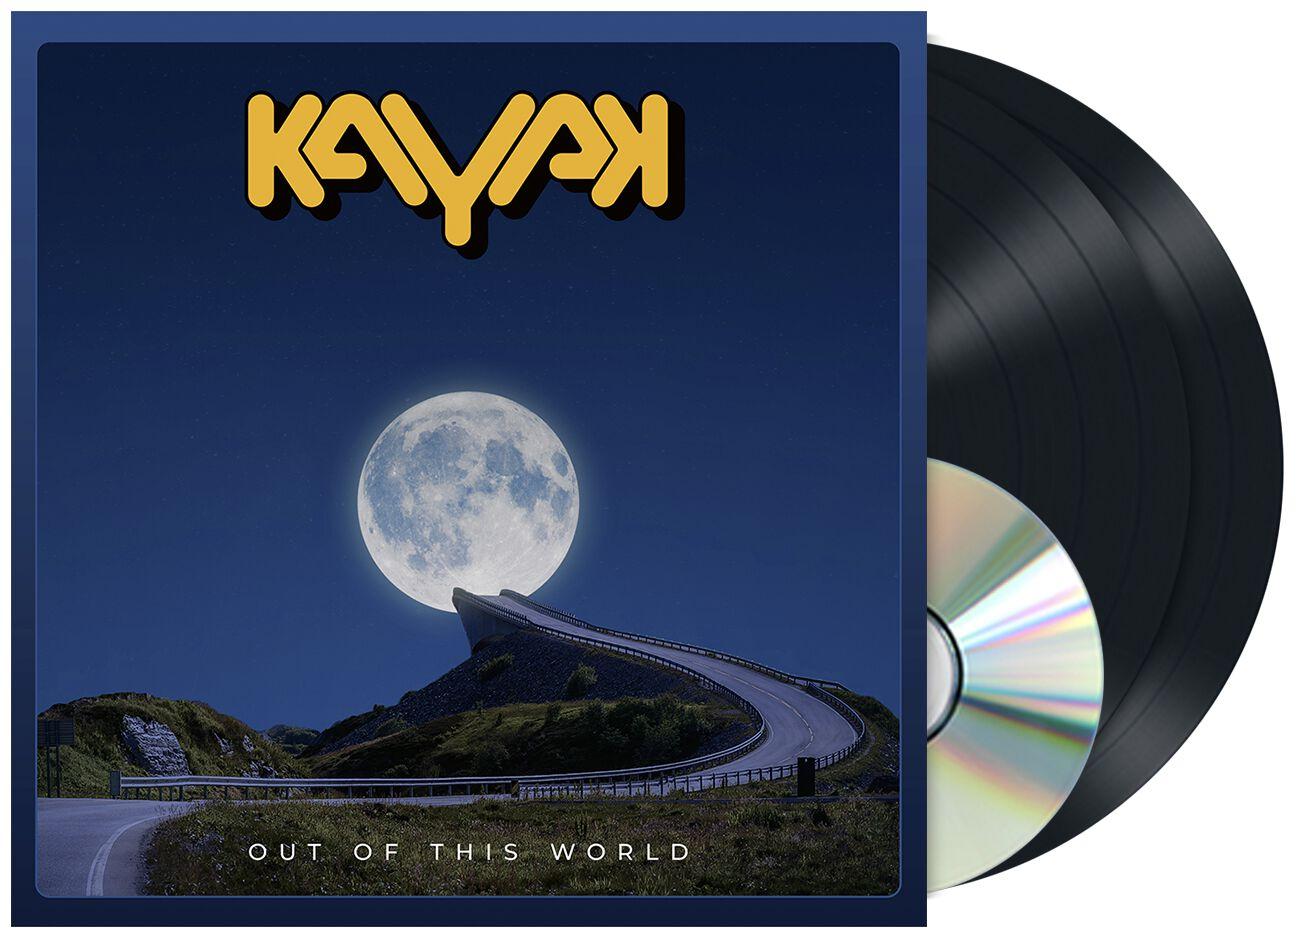 Image of Kayak Out of this world 2-LP & CD schwarz